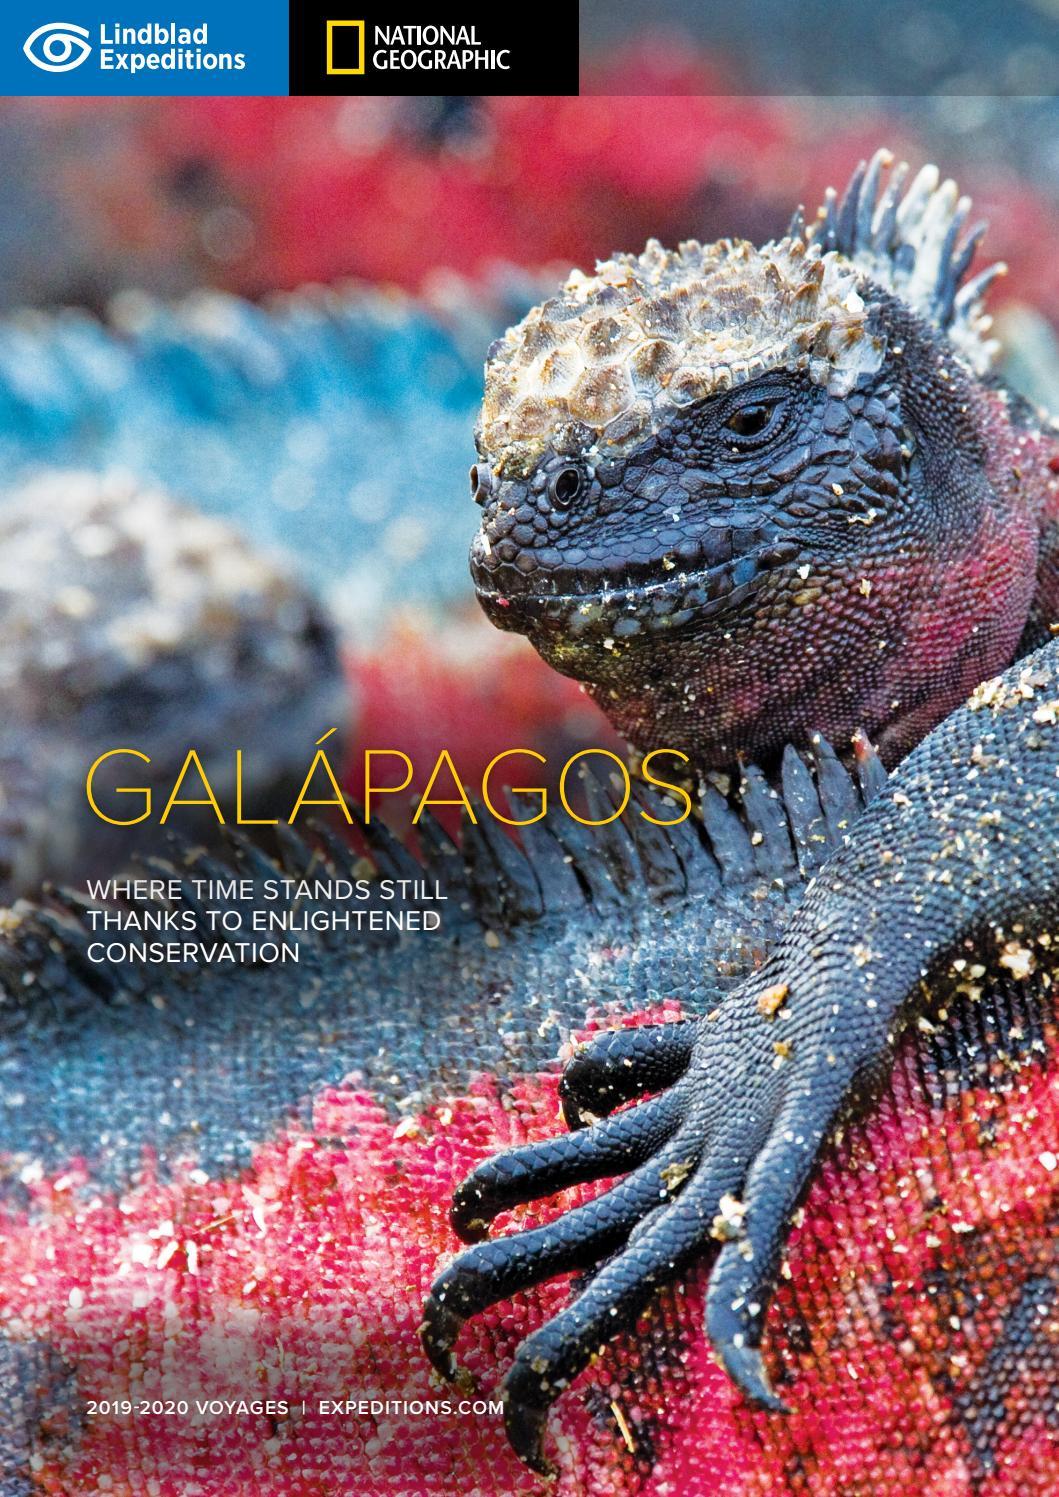 Lindblad Expeditions: Galapagos Islands